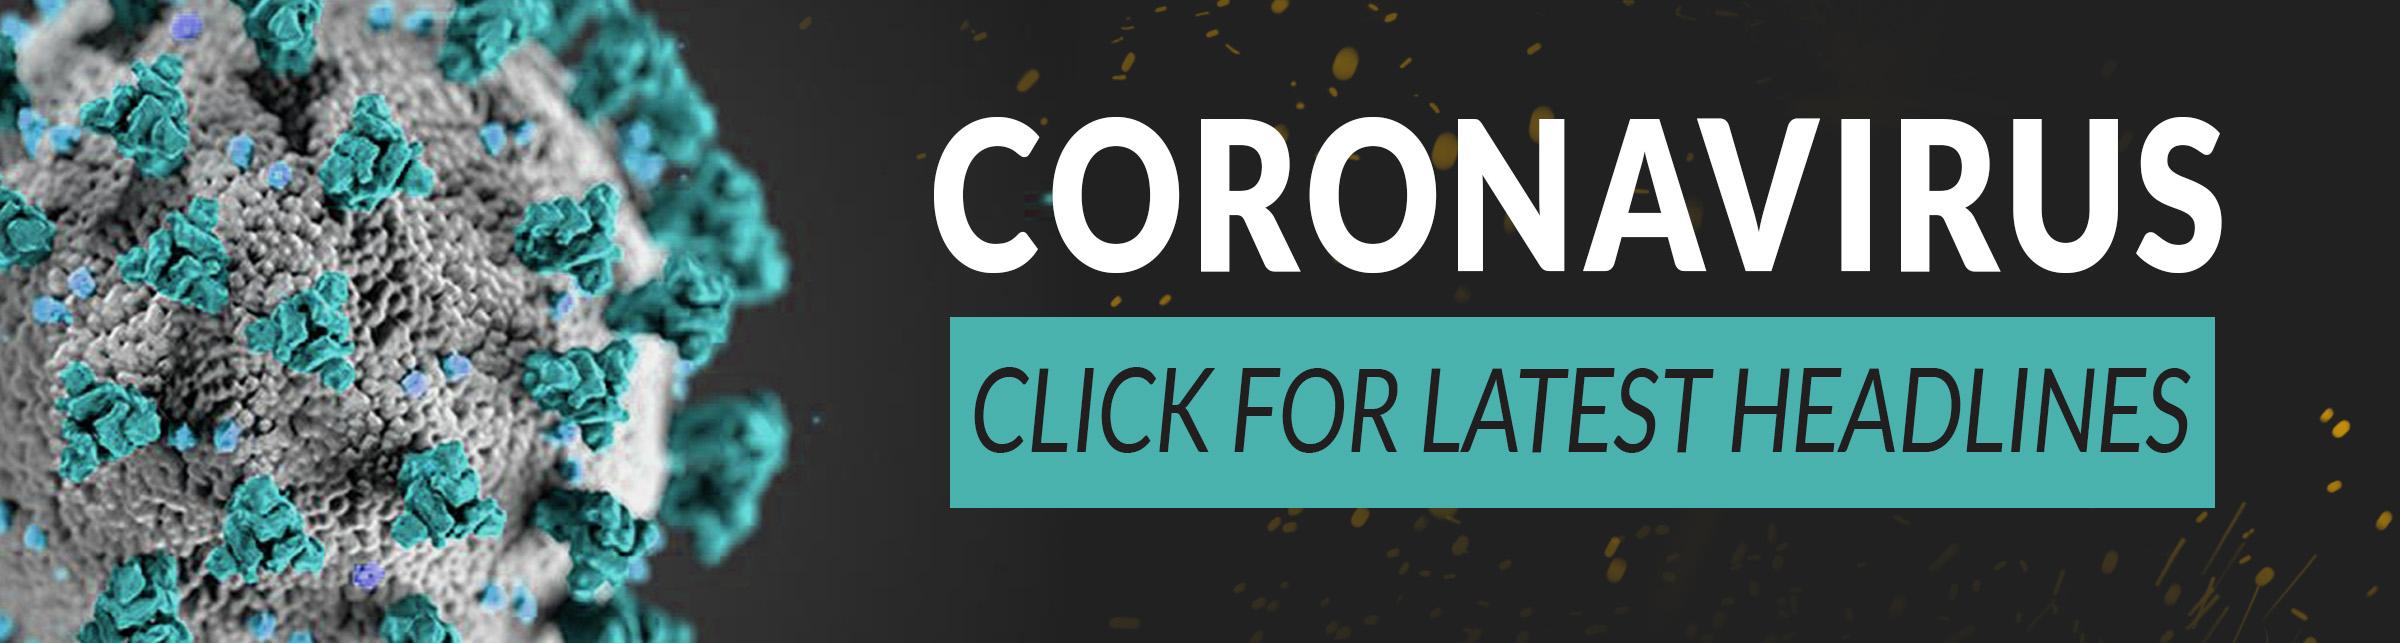 Click for more coronavirus stories.